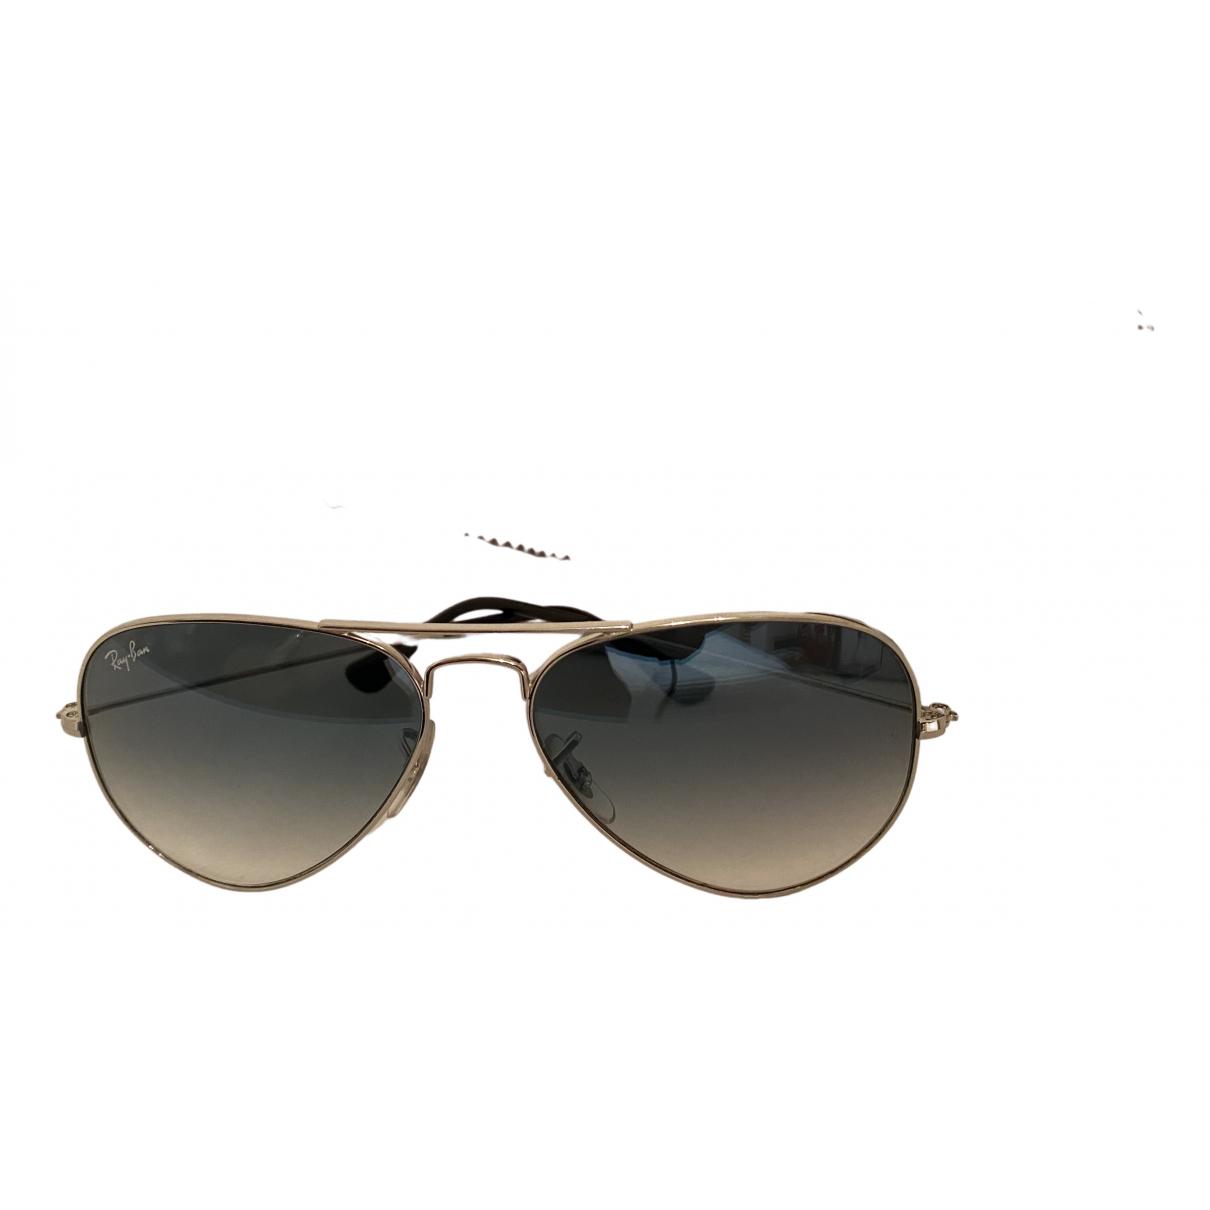 Ray-ban Aviator Multicolour Metal Sunglasses for Women N